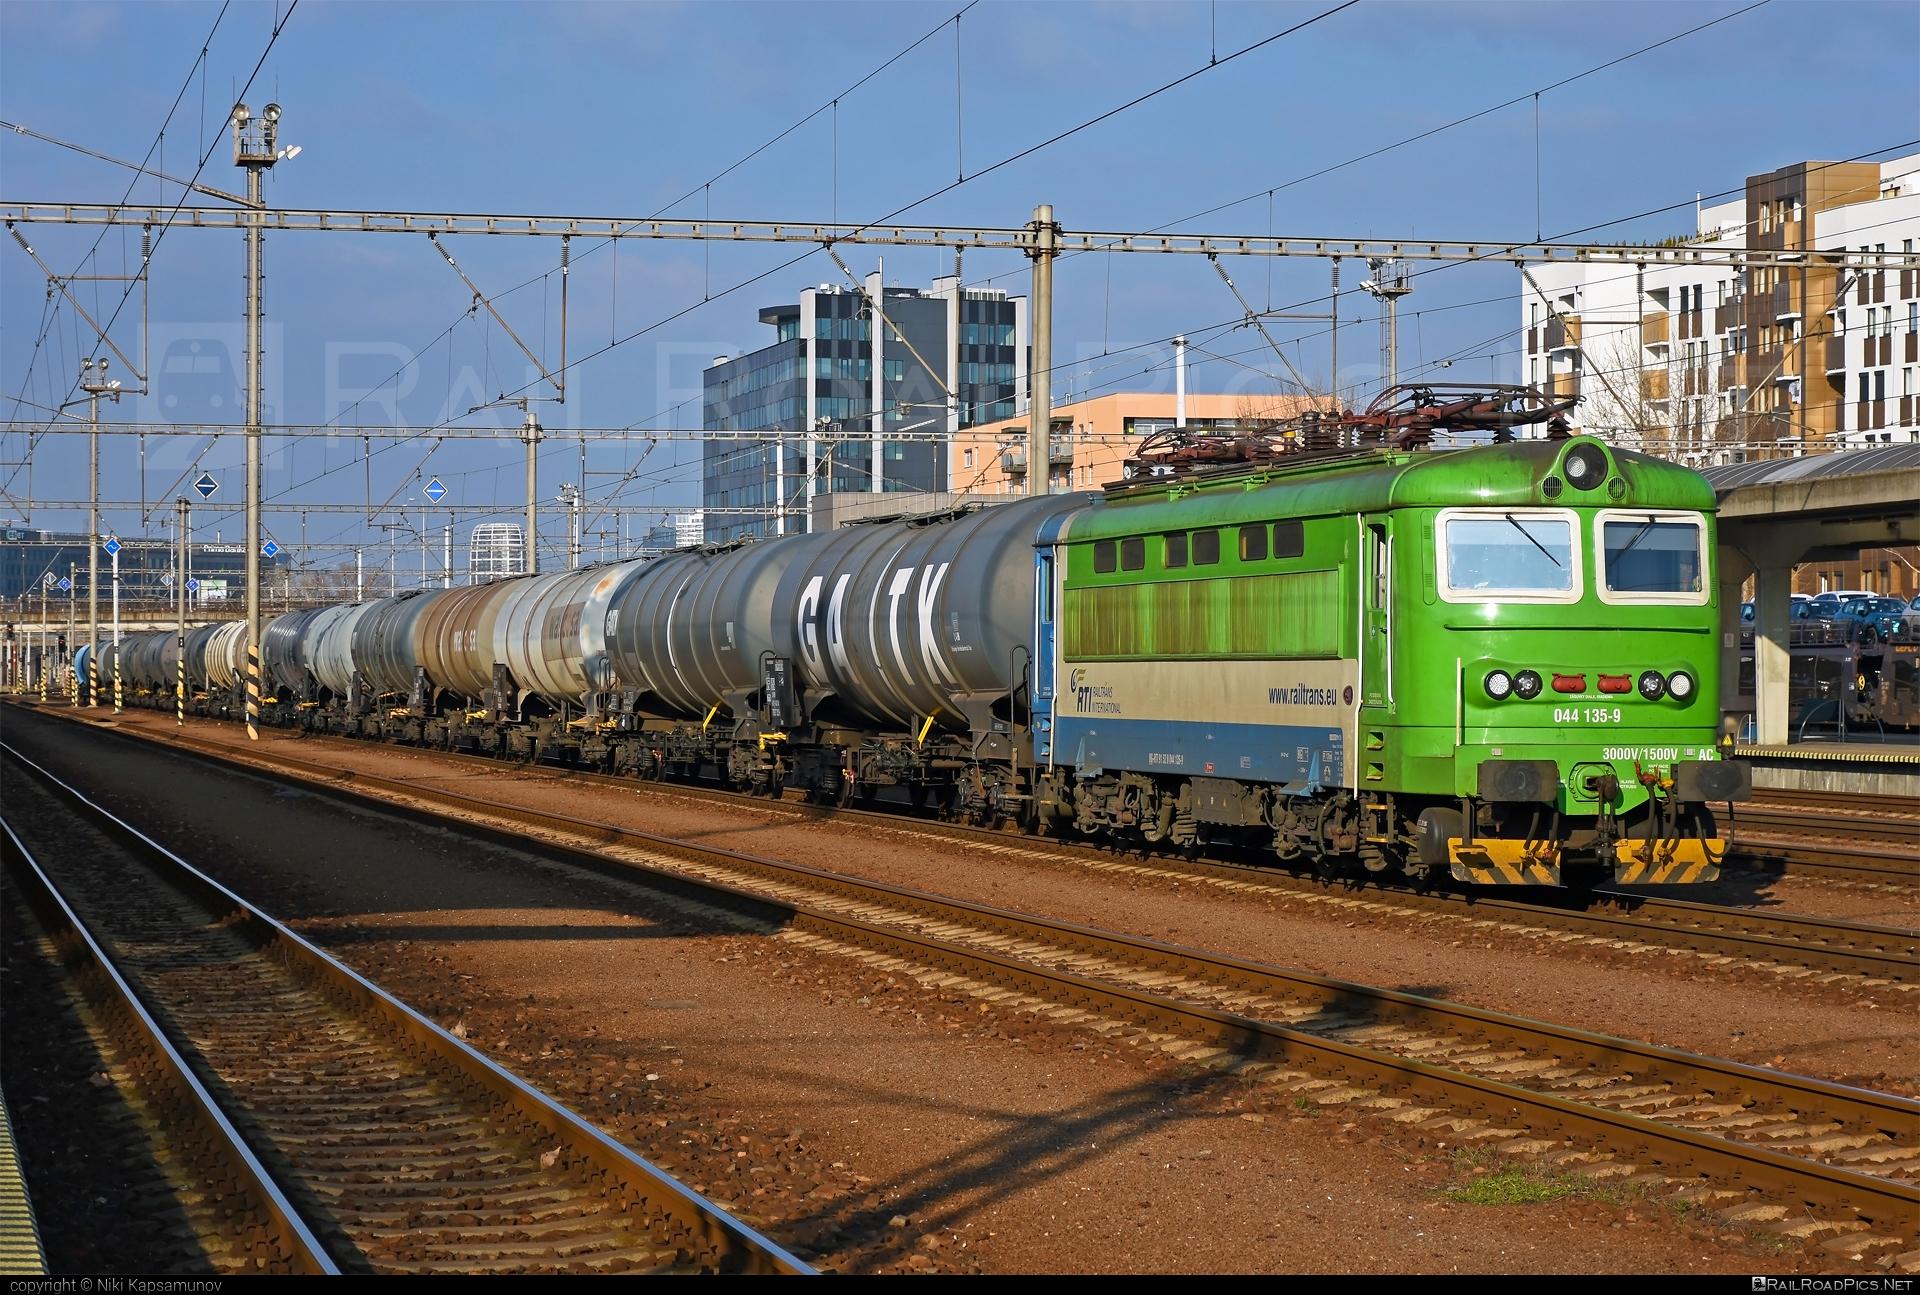 Škoda 73E - 044 135-9 operated by Railtrans International, s.r.o #RailtransInternational #gatx #kesselwagen #locomotive242 #plechac #rti #skoda #skoda73e #tankwagon